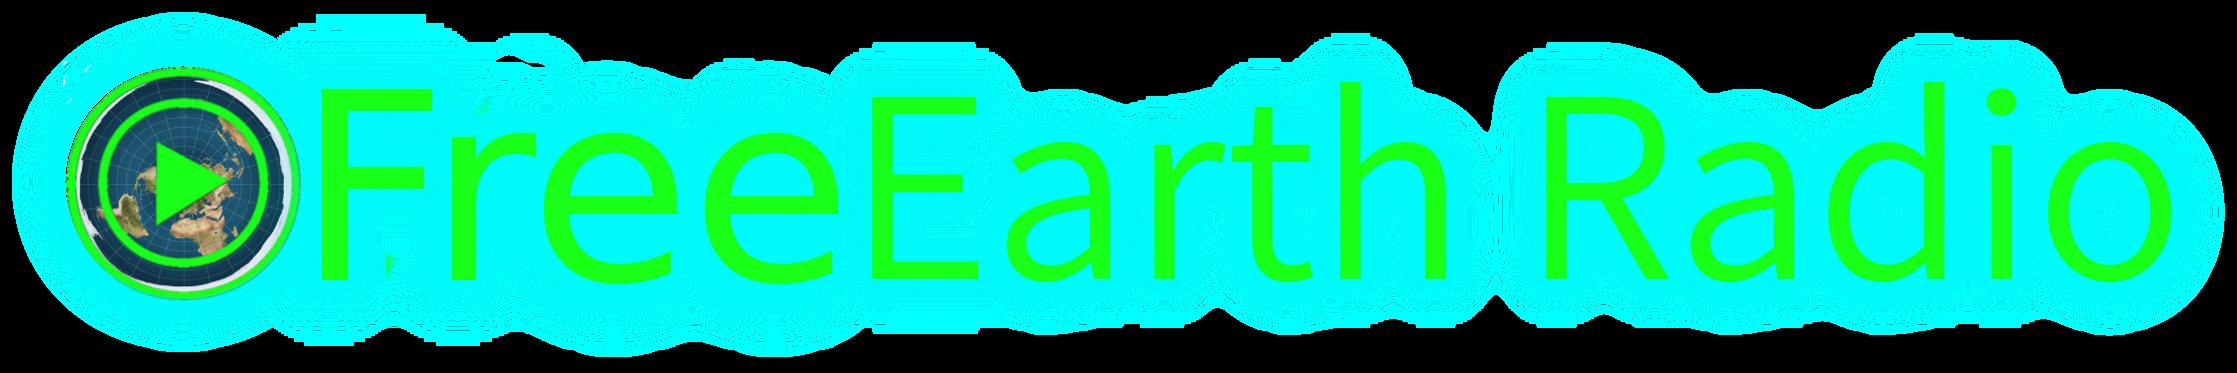 Free Earth Radio Live